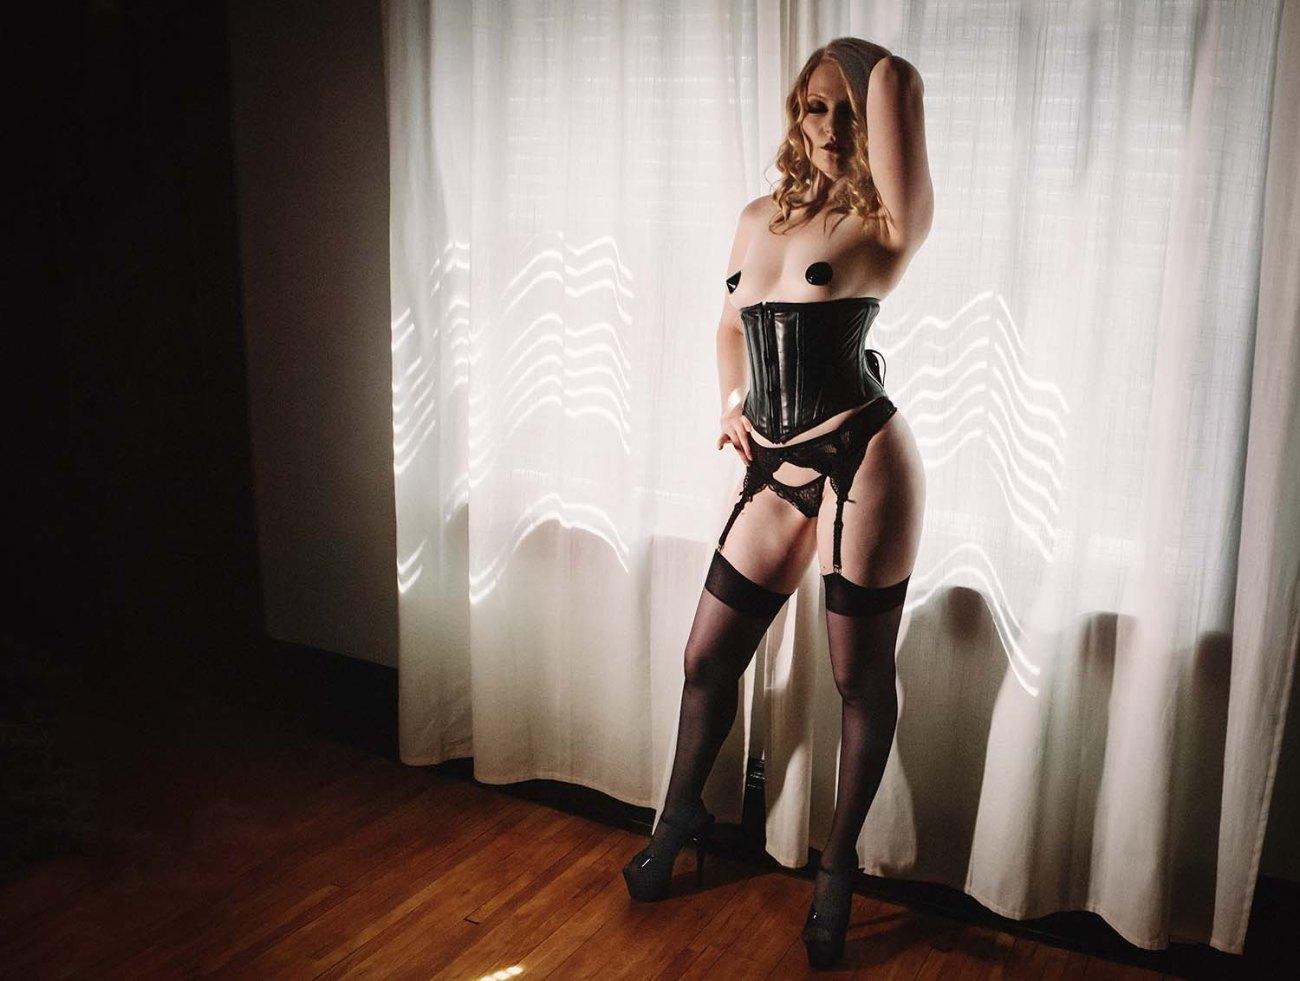 Minneapolis Boudoir Photographers Black Vinyl Corset Dark Moody Intimate Lifestyle Portraits, Saint Paul, Minnesota, Midwest, Erotic, Strip Tease, Gift